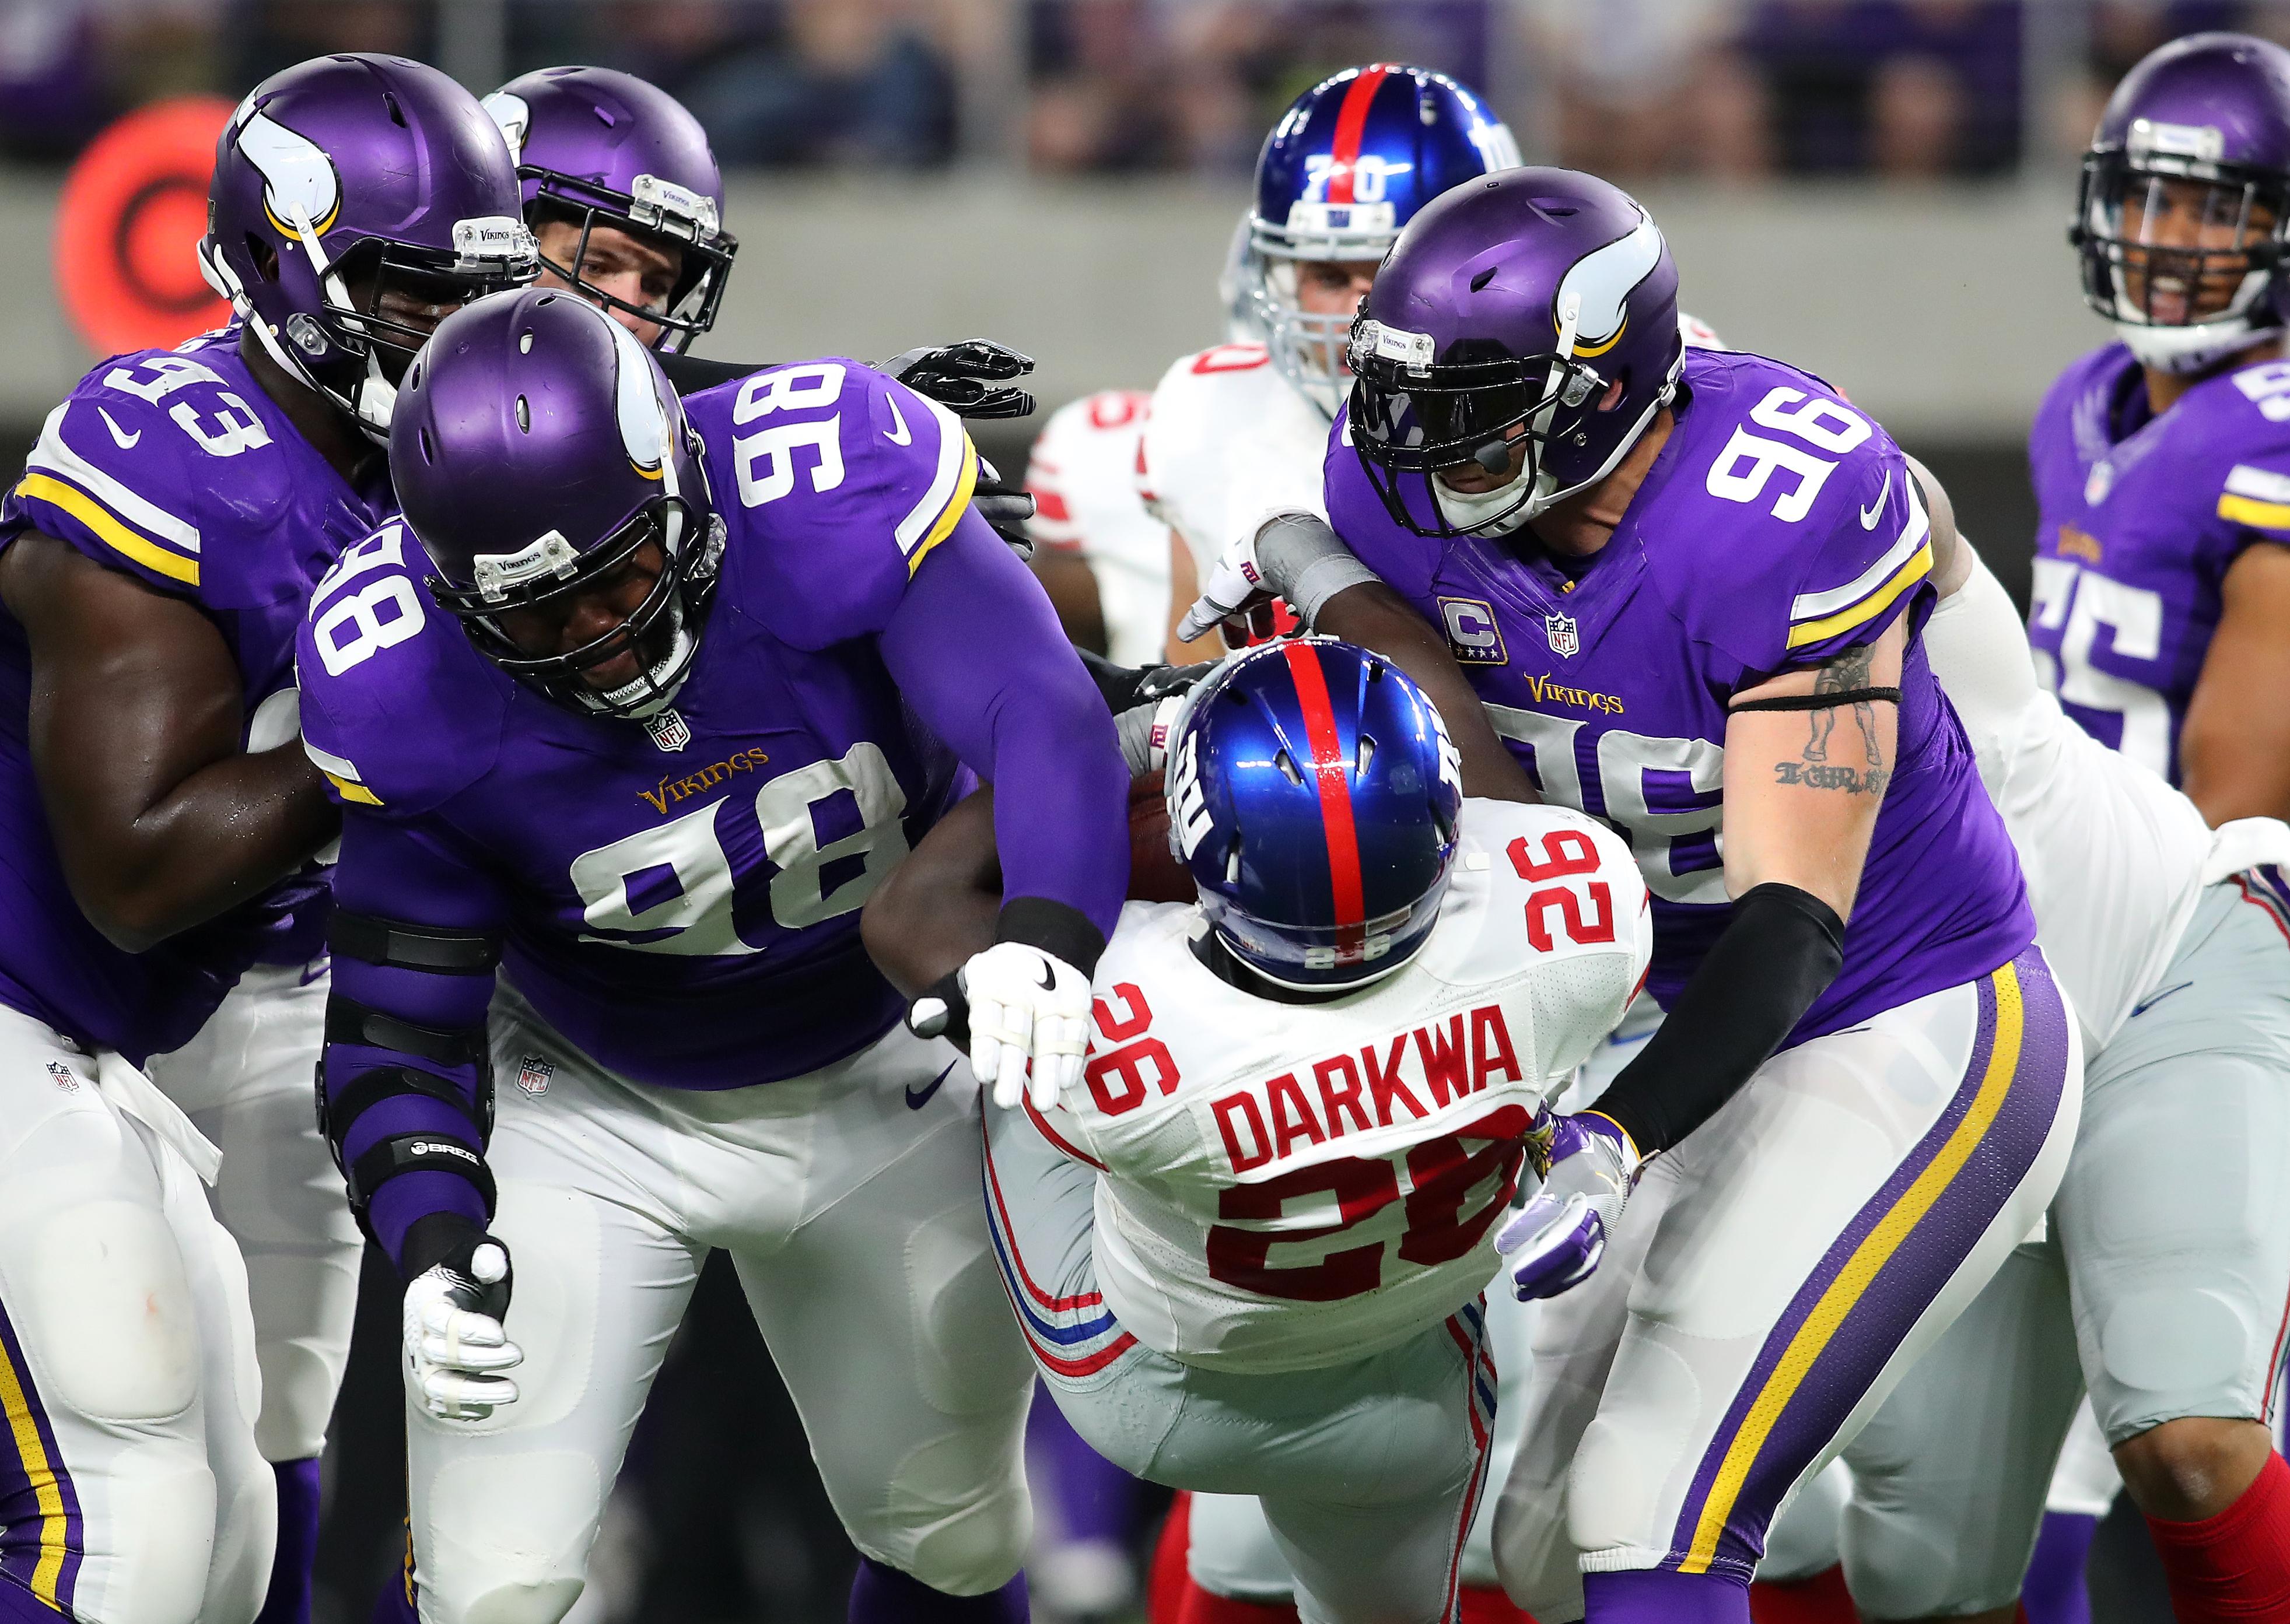 Orleans Darkwa rudely tackled by Minnesota defenders